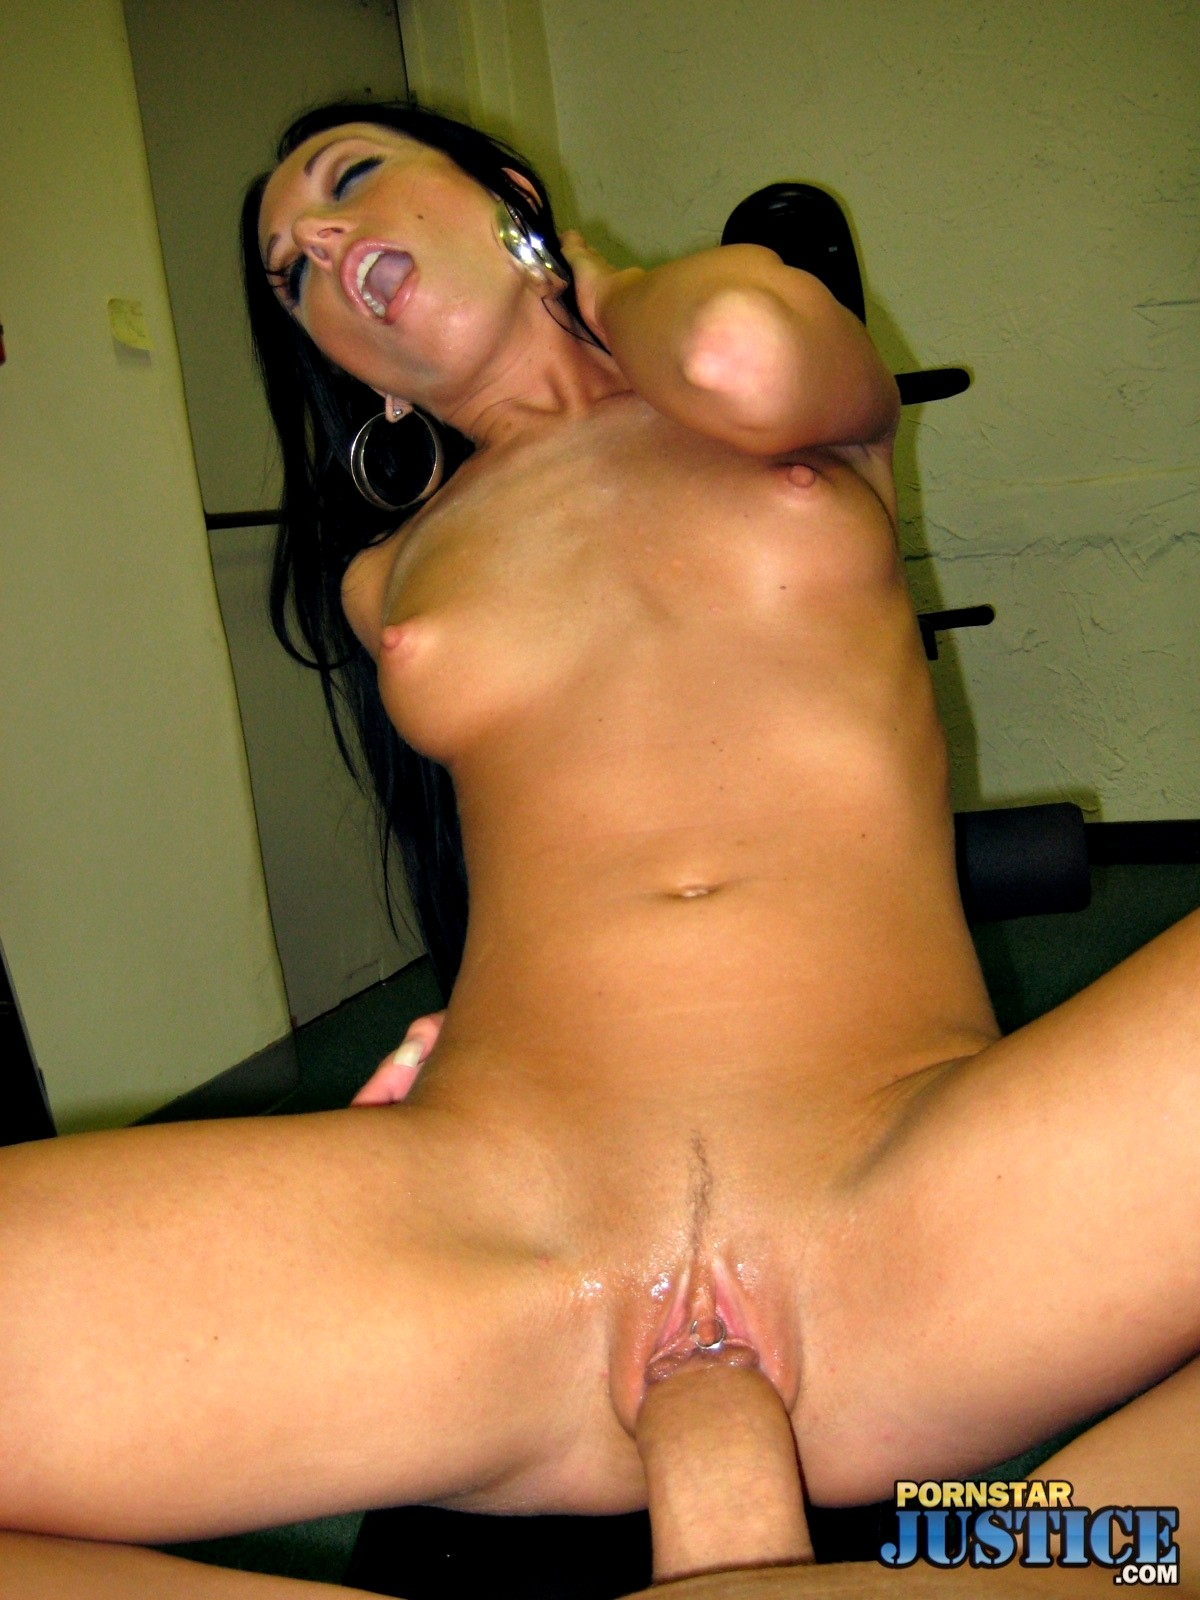 Mardi gras party girl spreads her pierced pussy wide open